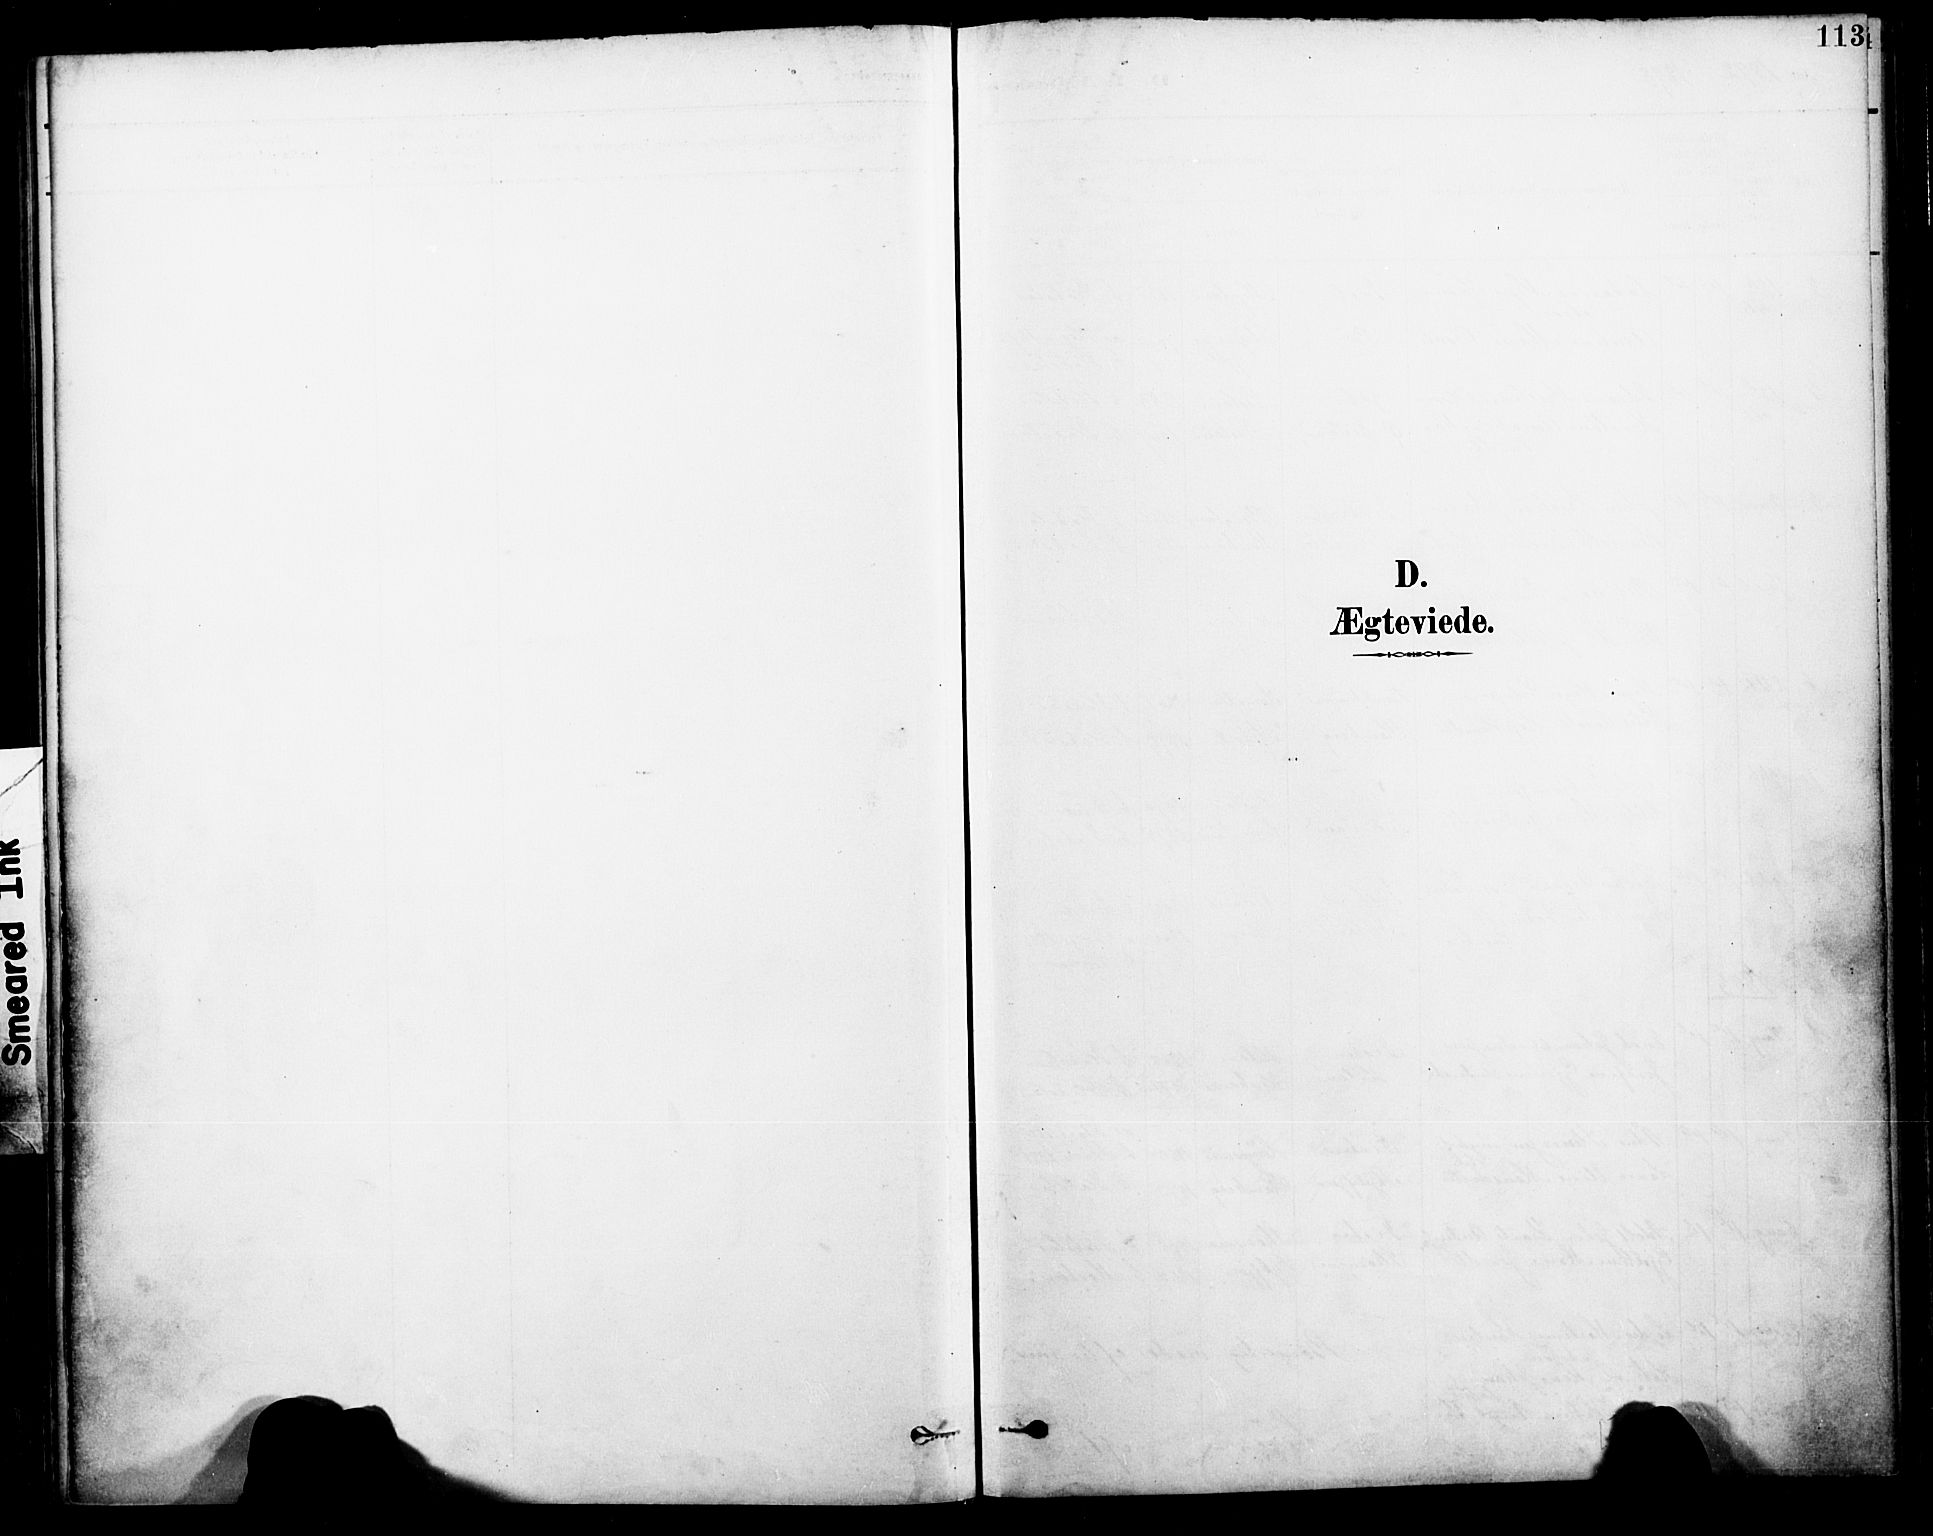 SAT, Ministerialprotokoller, klokkerbøker og fødselsregistre - Nordland, 885/L1205: Ministerialbok nr. 885A06, 1892-1905, s. 113